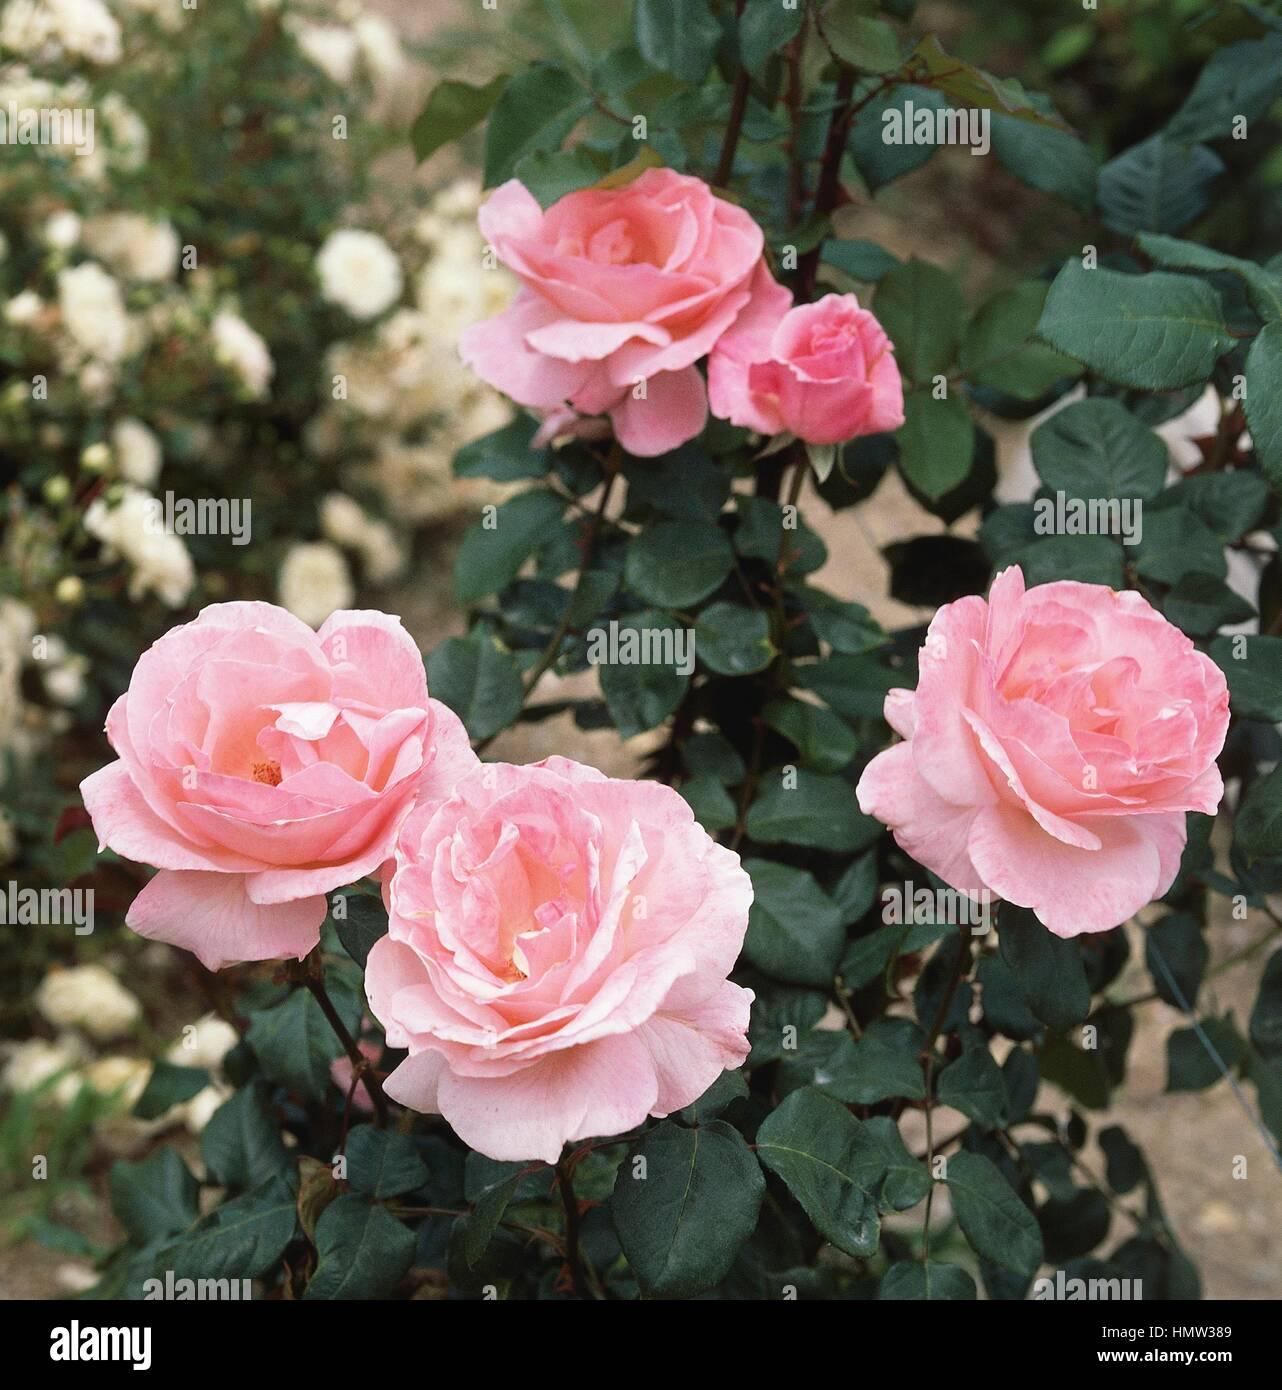 queen elizabeth rose rosa sp floribunda hybrid rosaceae stock photo 133317081 alamy. Black Bedroom Furniture Sets. Home Design Ideas